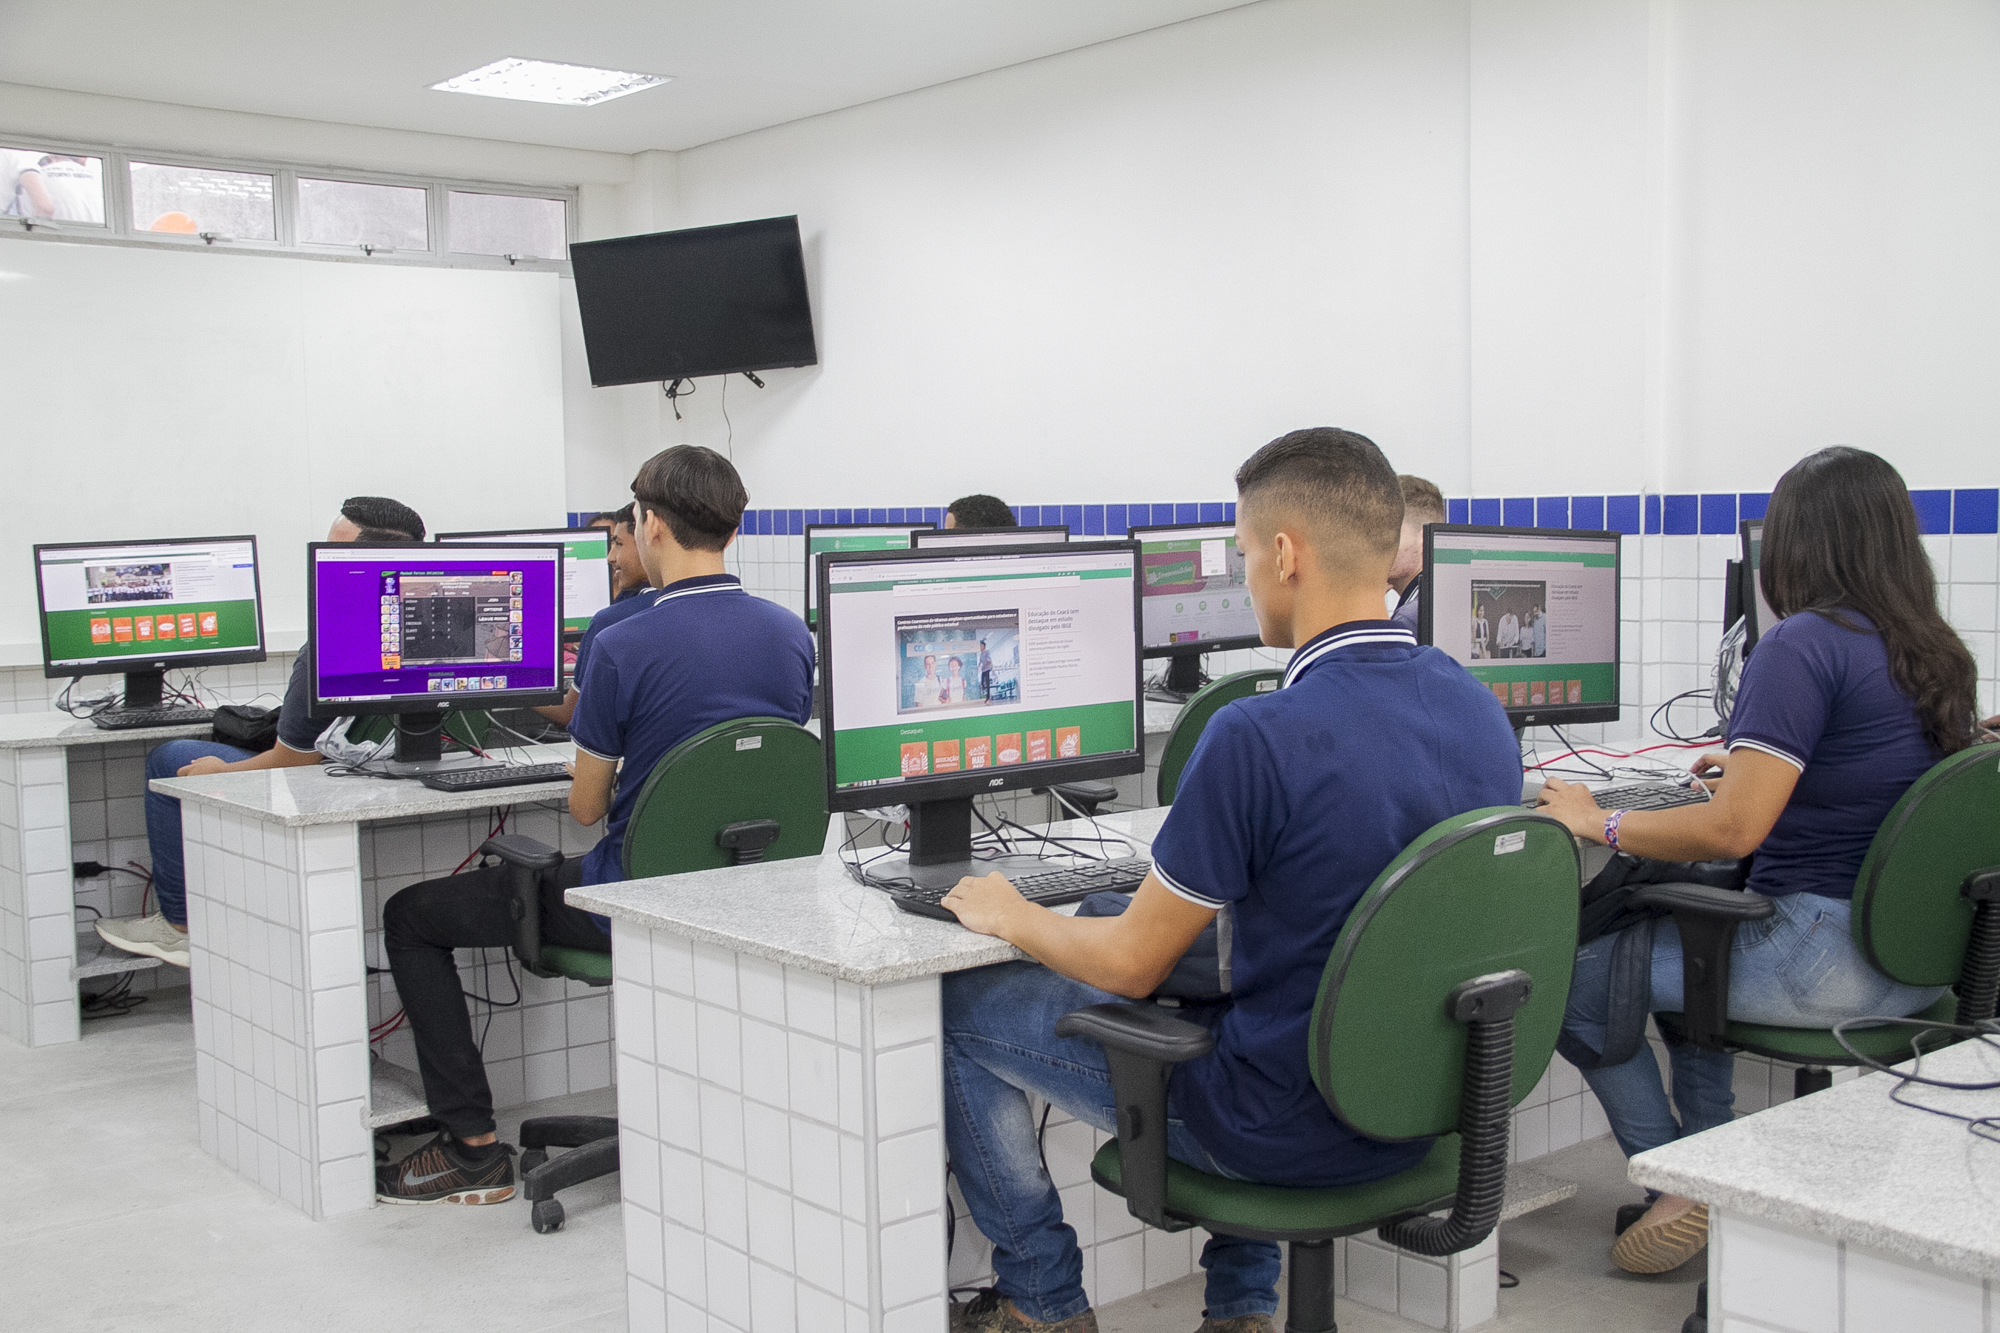 sede renovada da EEFM Deputado Paulino Rocha